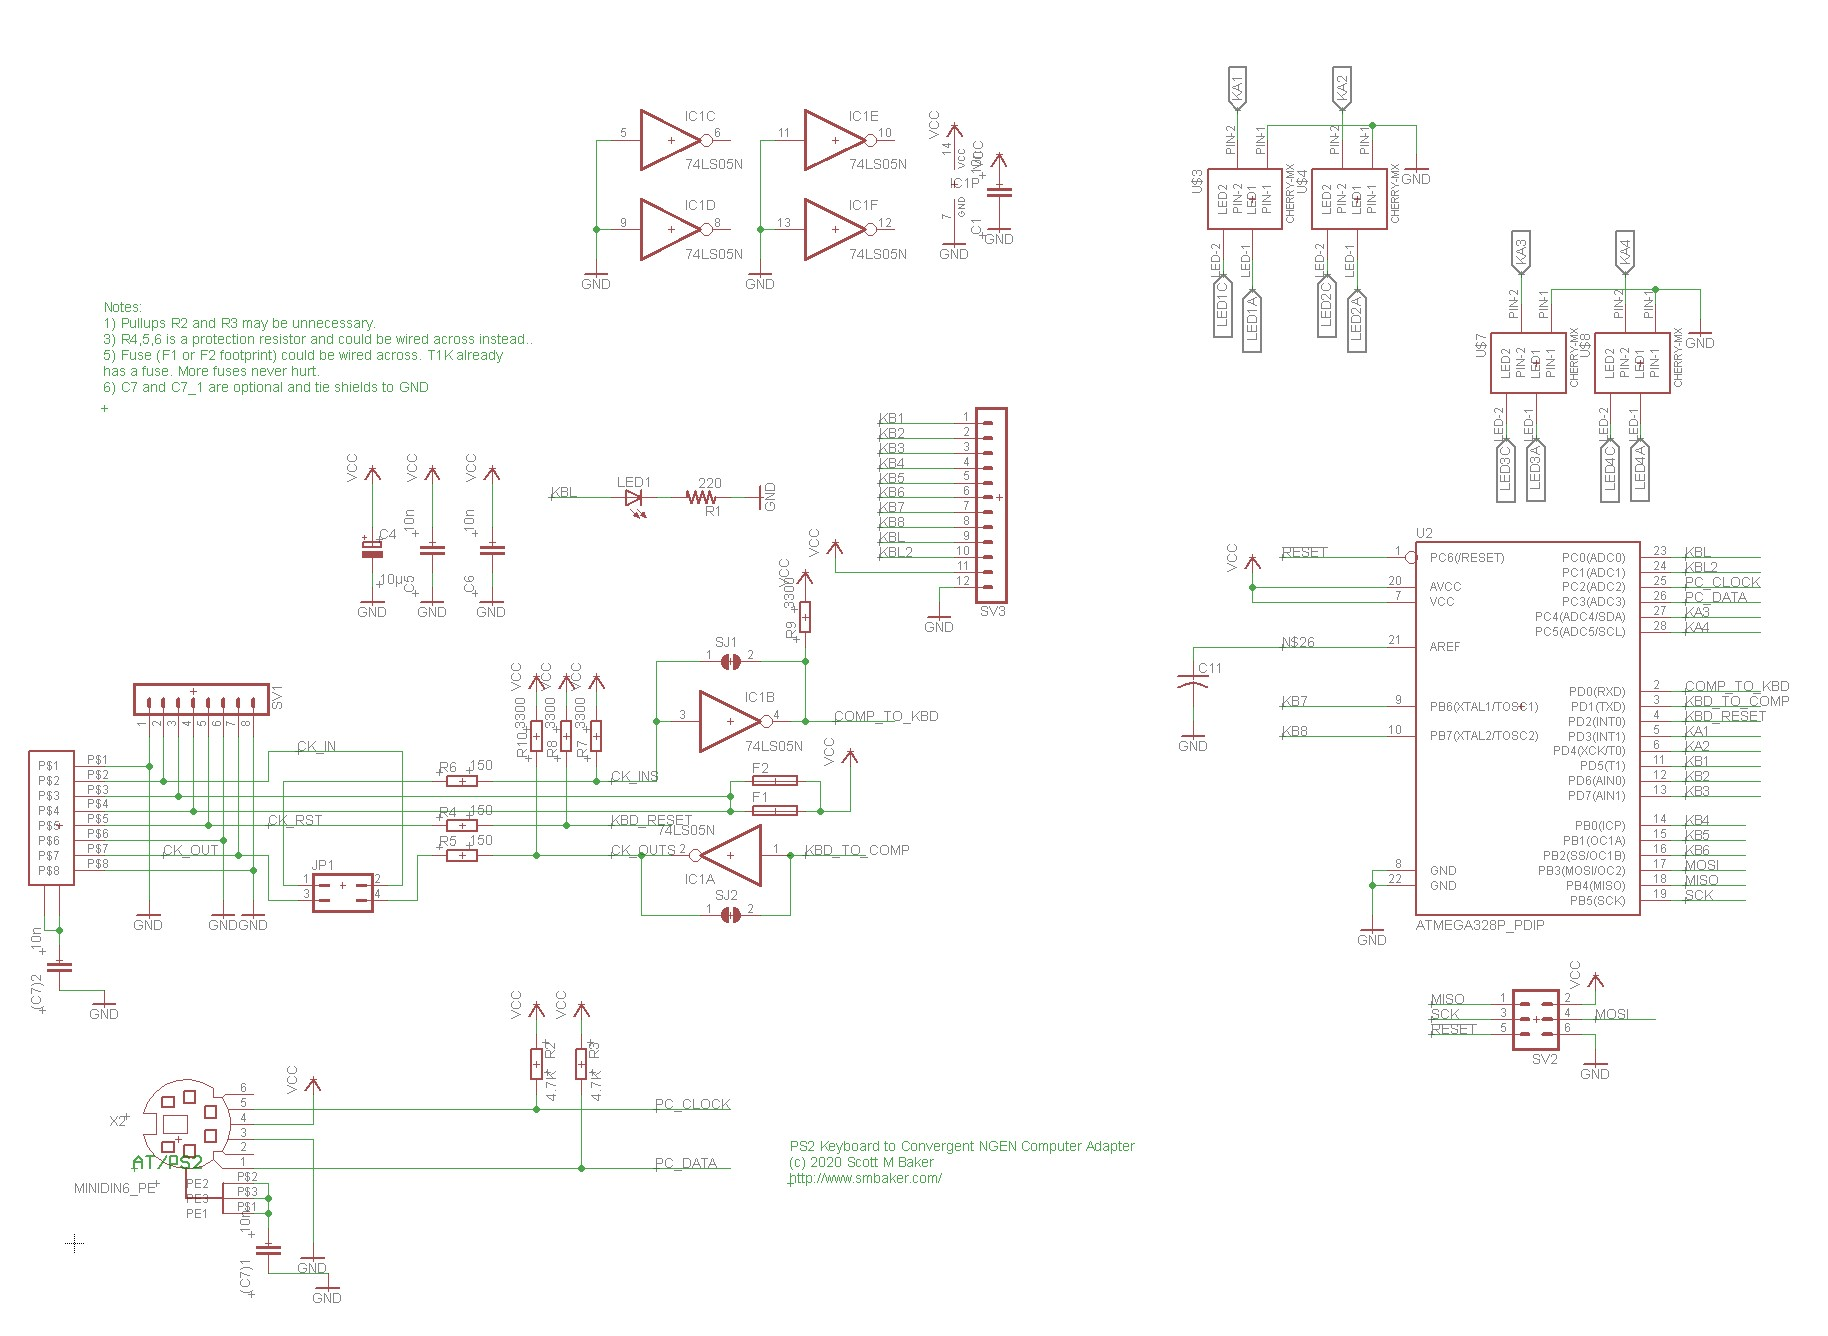 Restoring a Convergent Technologies NGEN PC/Workstation